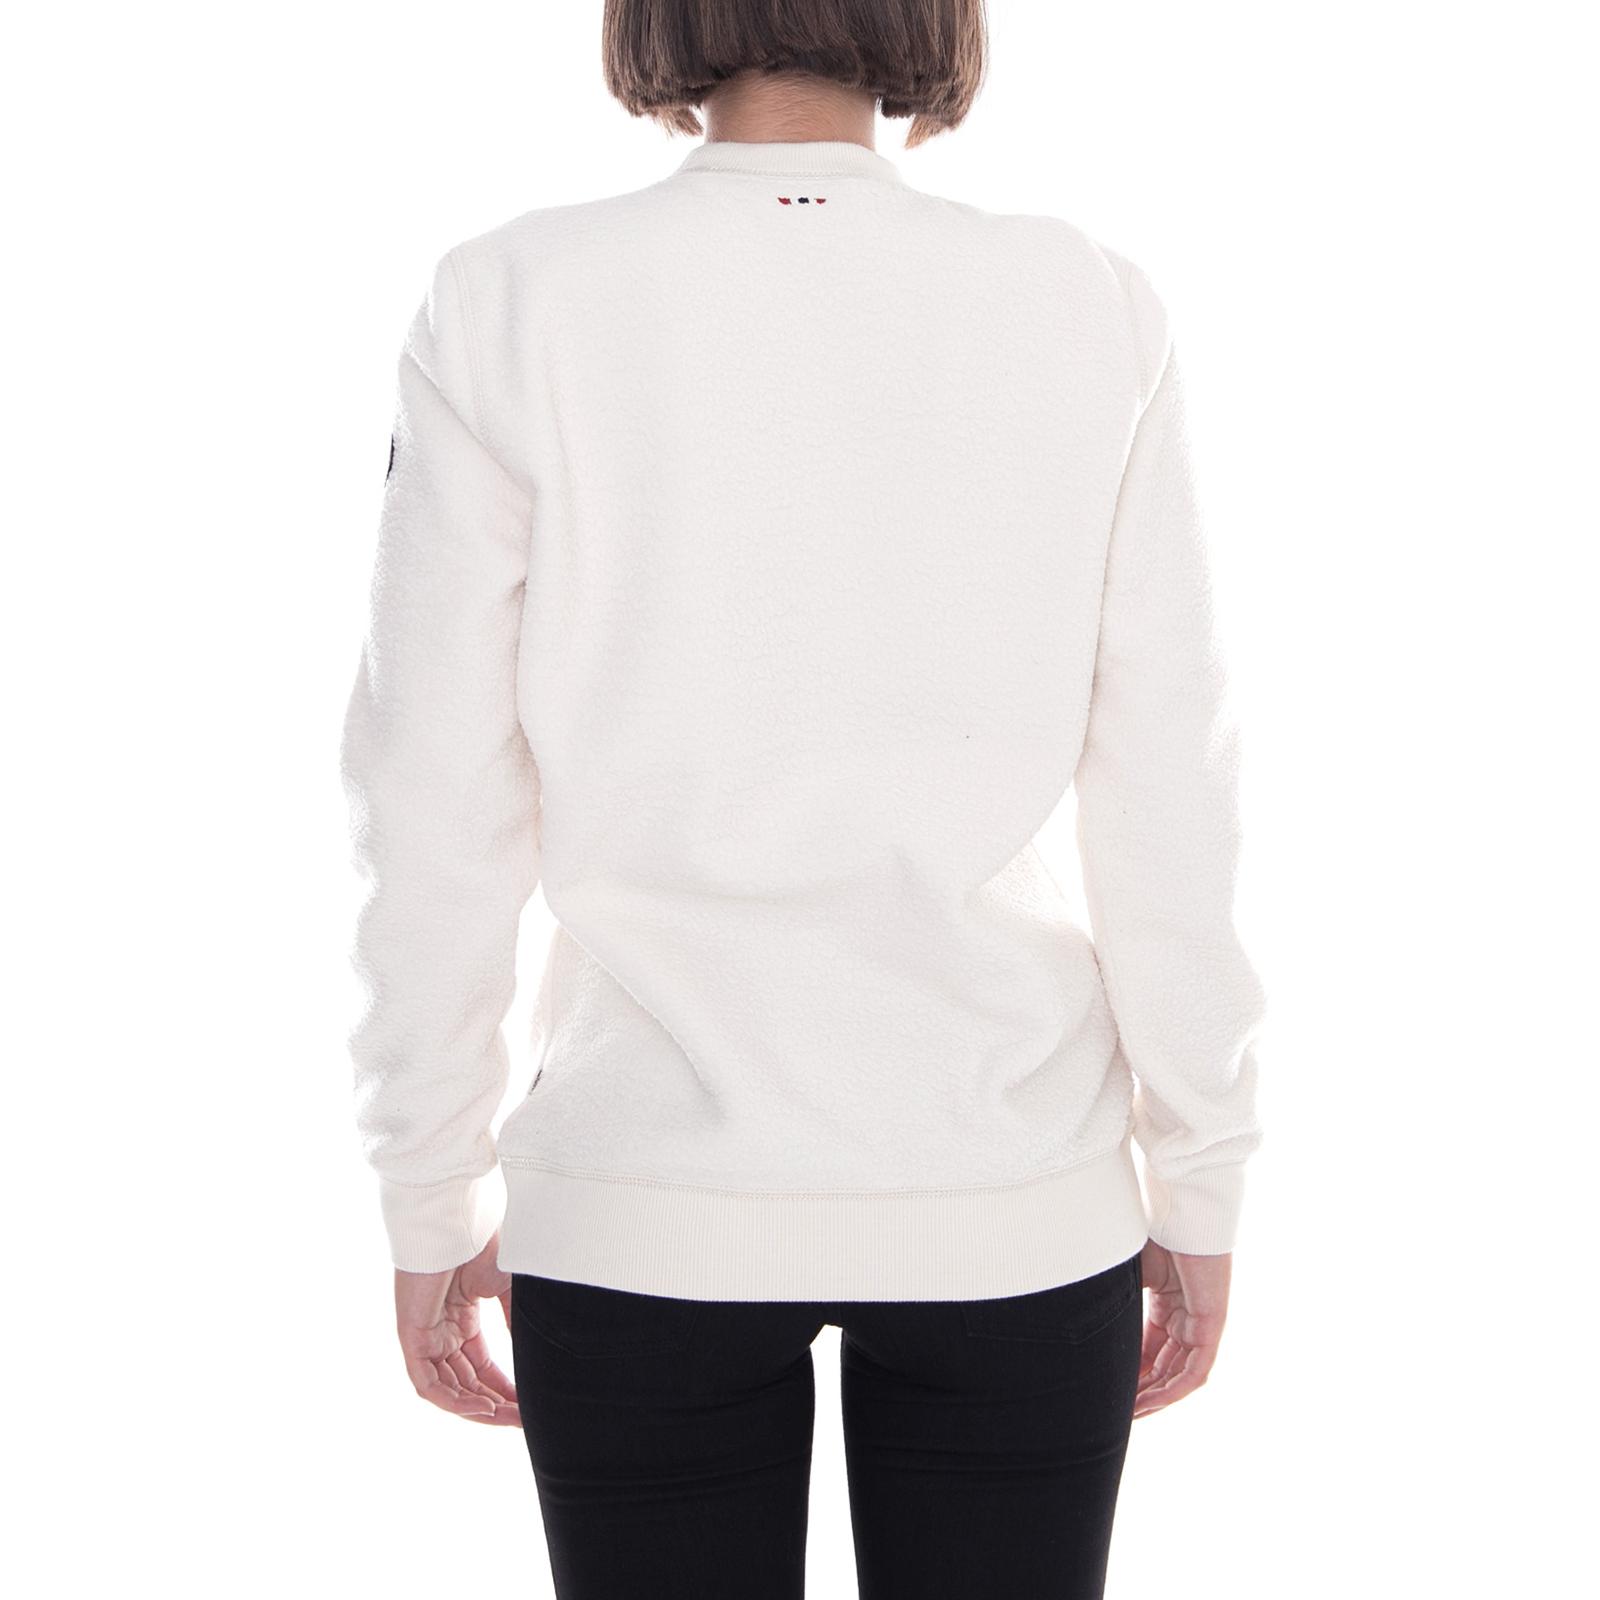 Napapijri Apprivoiser Sweatshirts Neuf Blanc Lait Wom r0rwq56